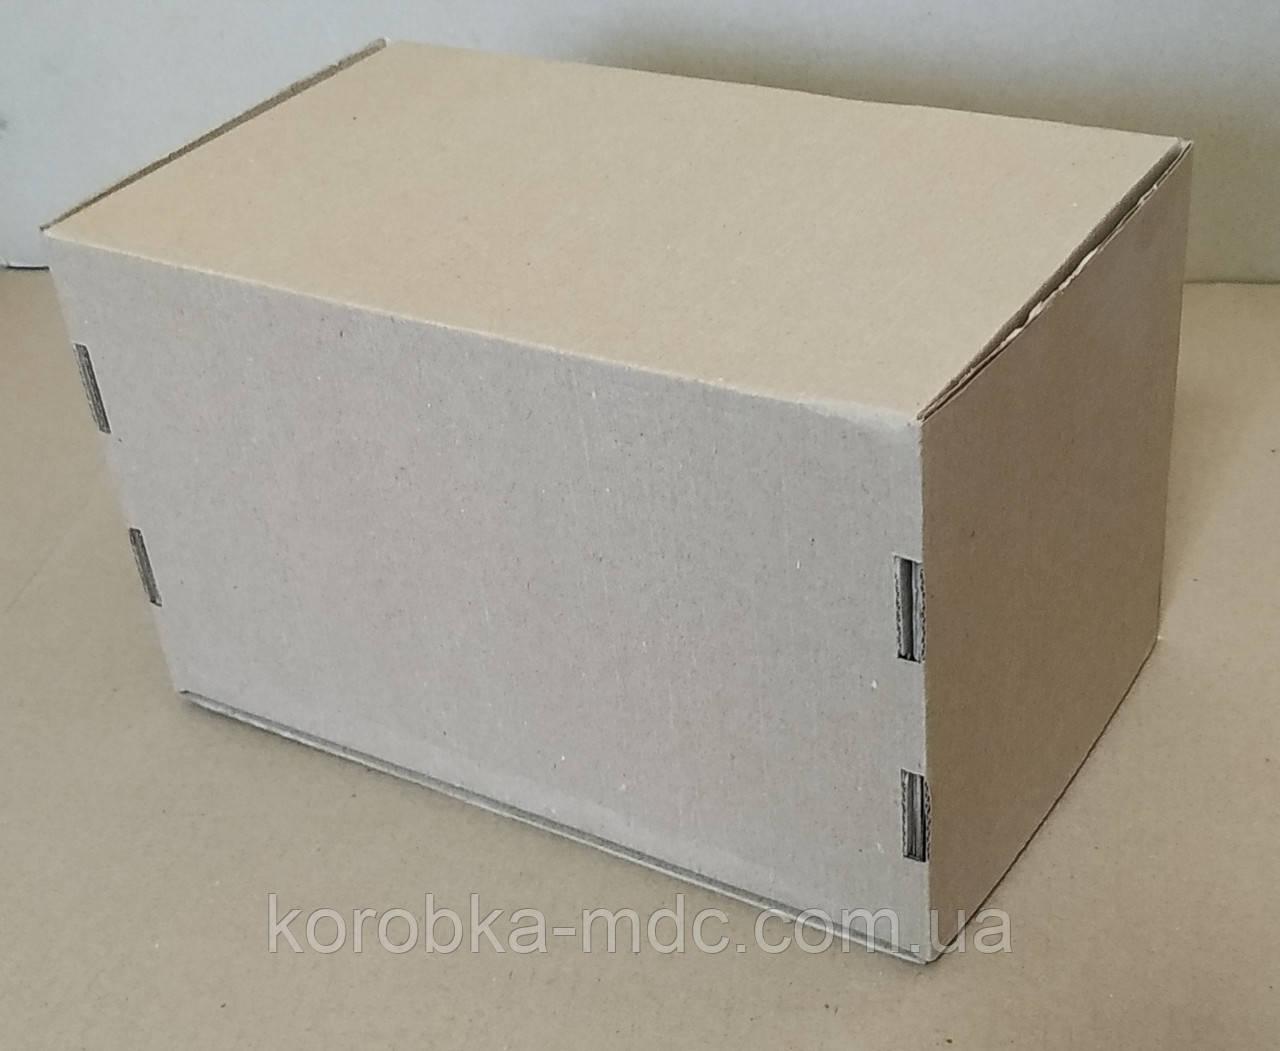 Коробка бурая 270х166х166 самосборная (шкатулка)